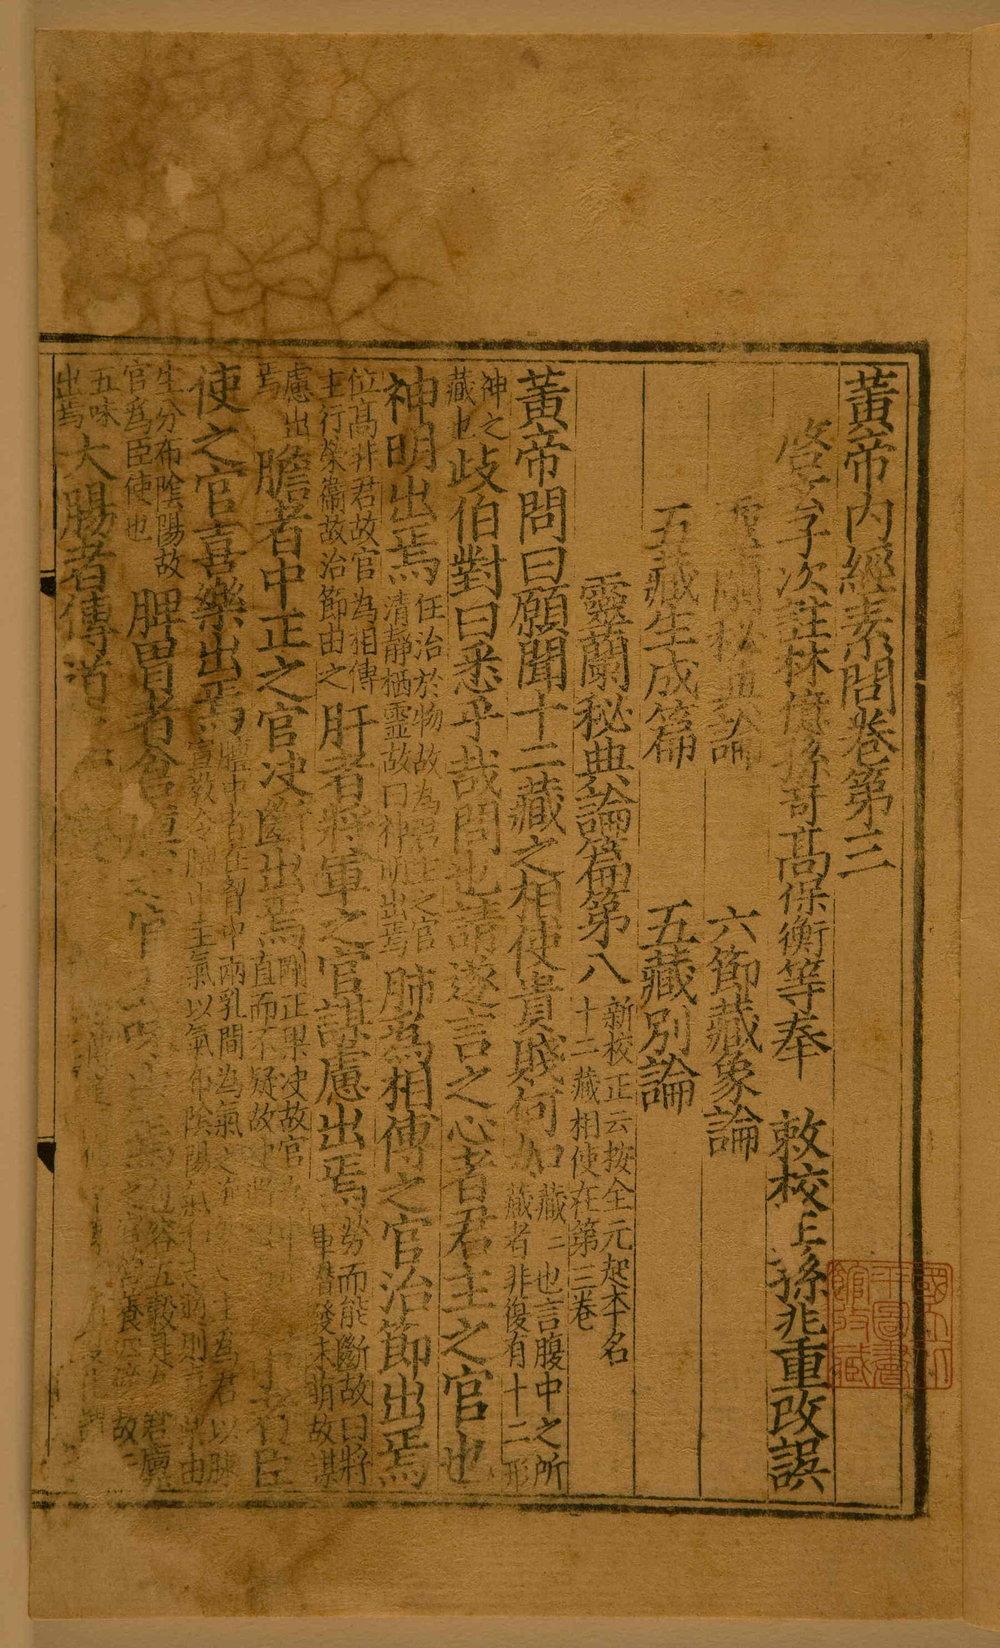 Image:  National Library of China